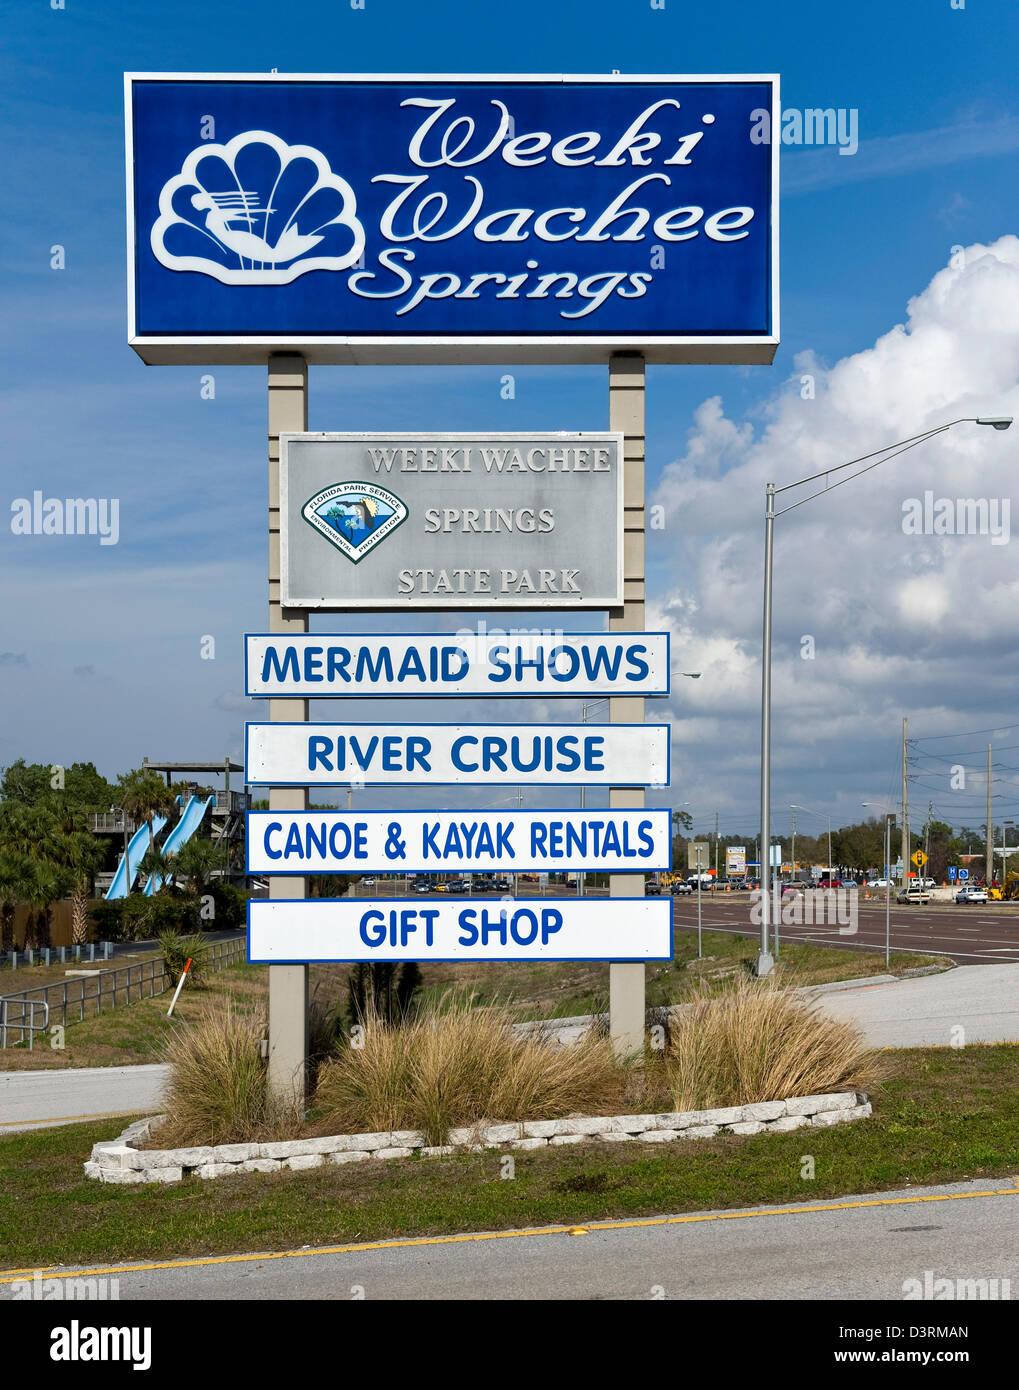 Weeki Wachee Springs Mermaid Show Photos & Weeki Wachee Springs